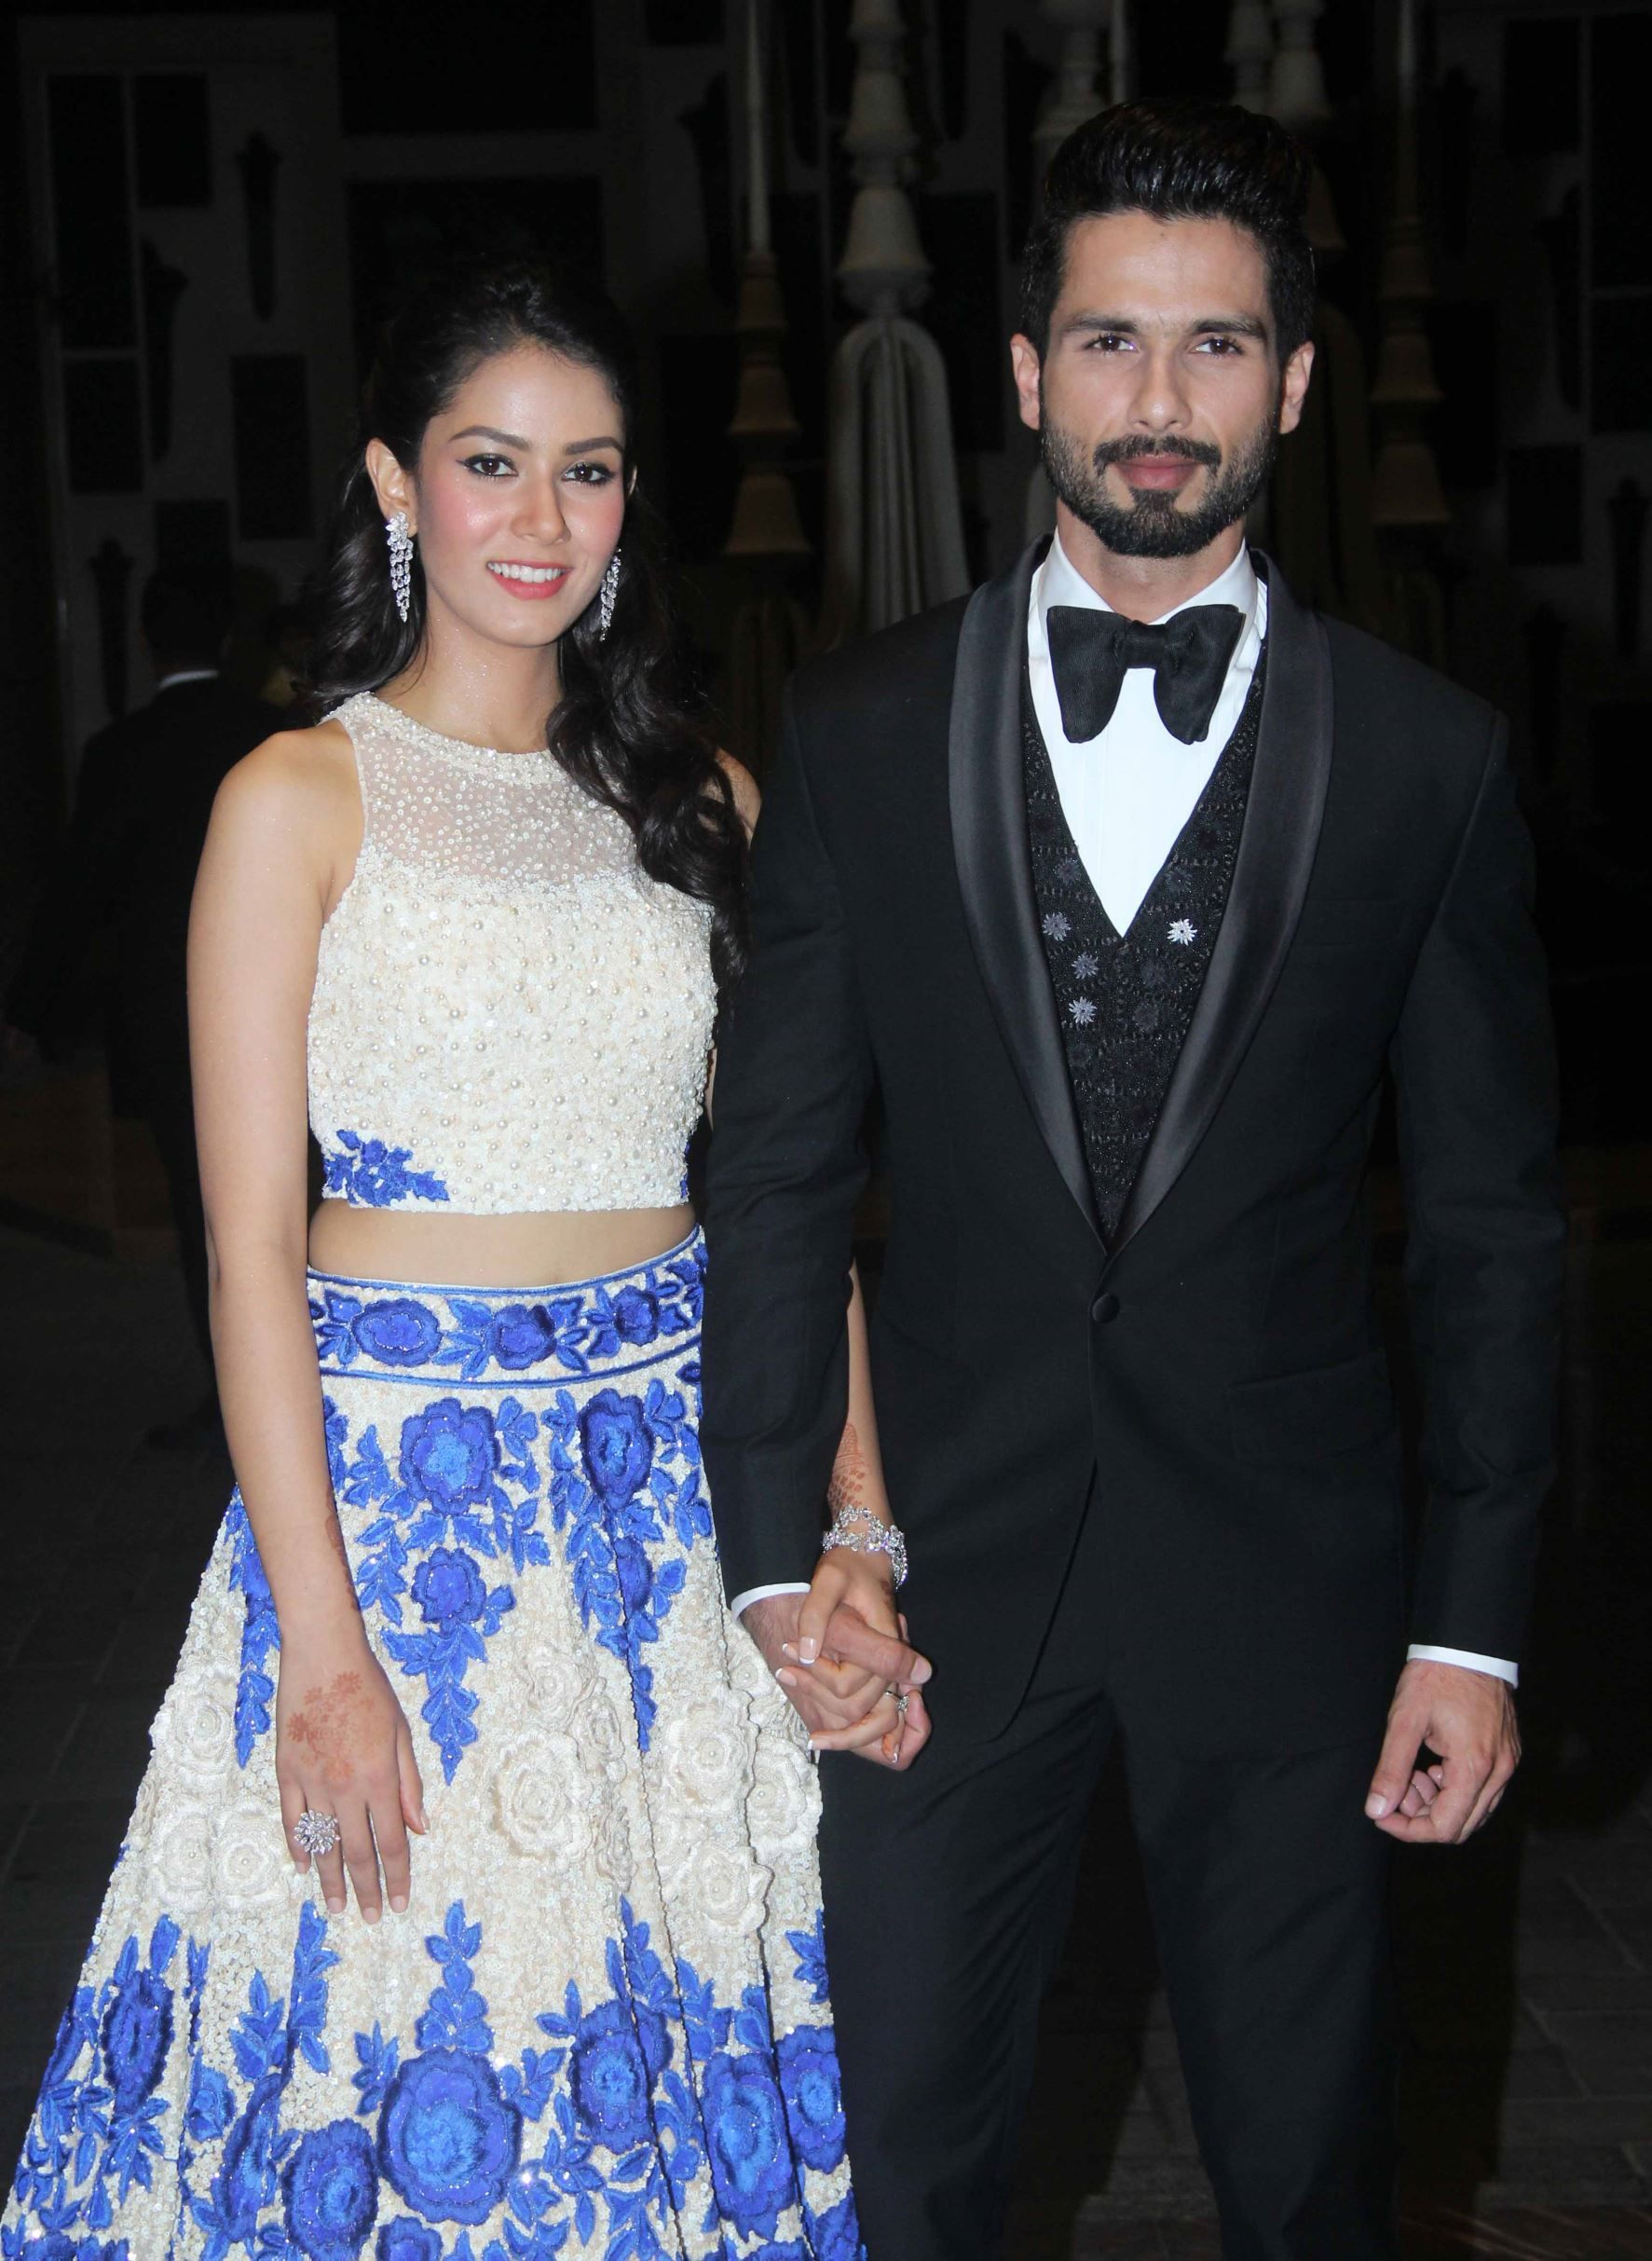 Shahid Kapoor S Wedding Reception Shahid Kapoor Wedding Indian Dresses Dresses